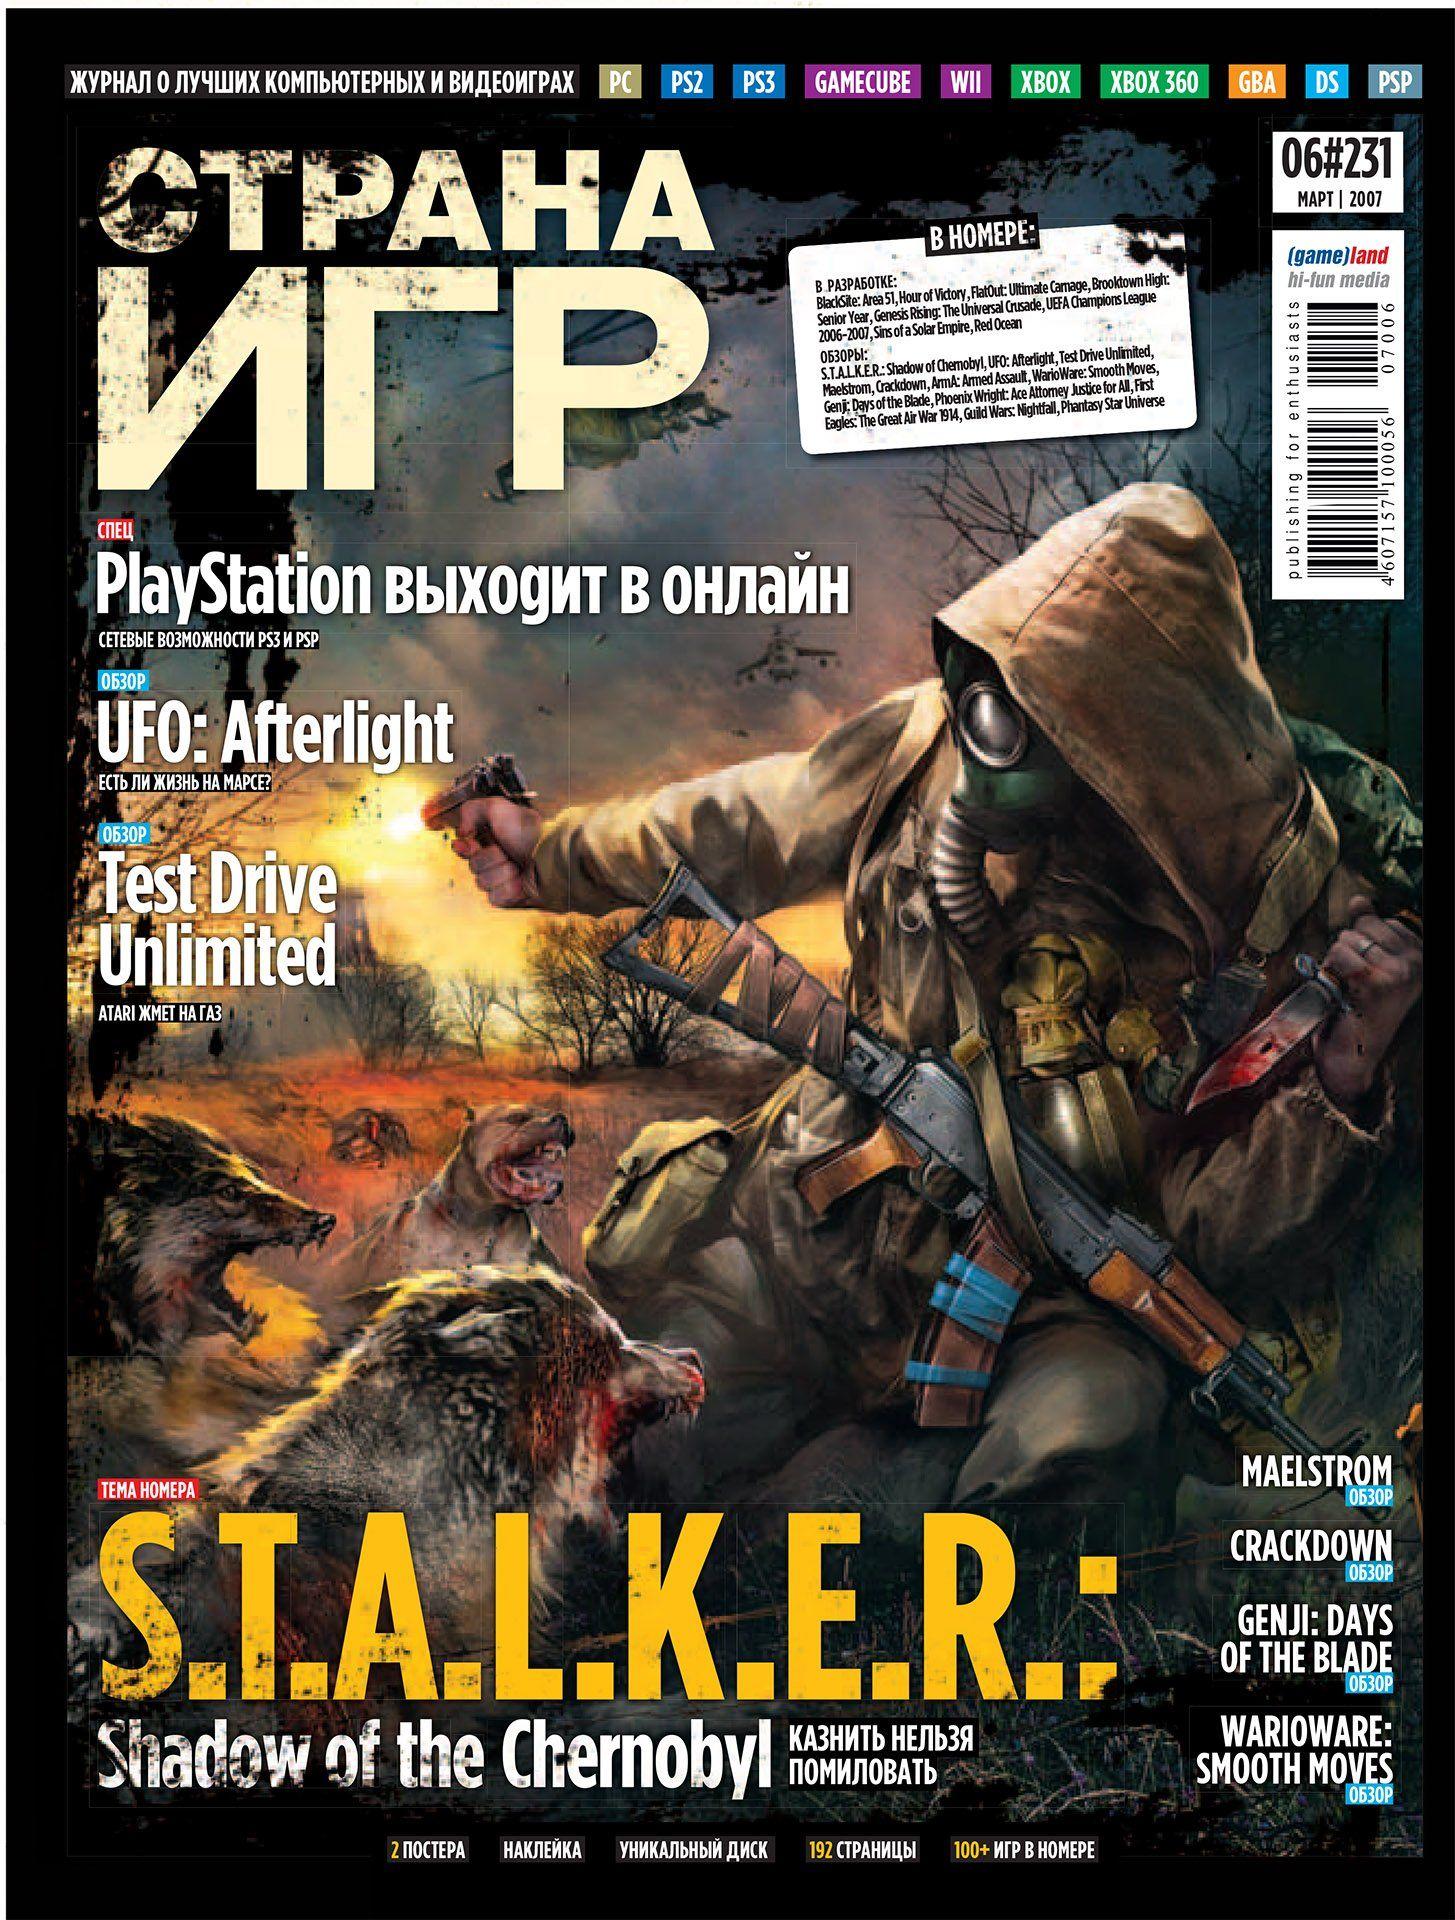 New Image:  GameLand 231 March 2007 https://t.co/vHnSvDv9XM https://t.co/AWhbLC6L3z